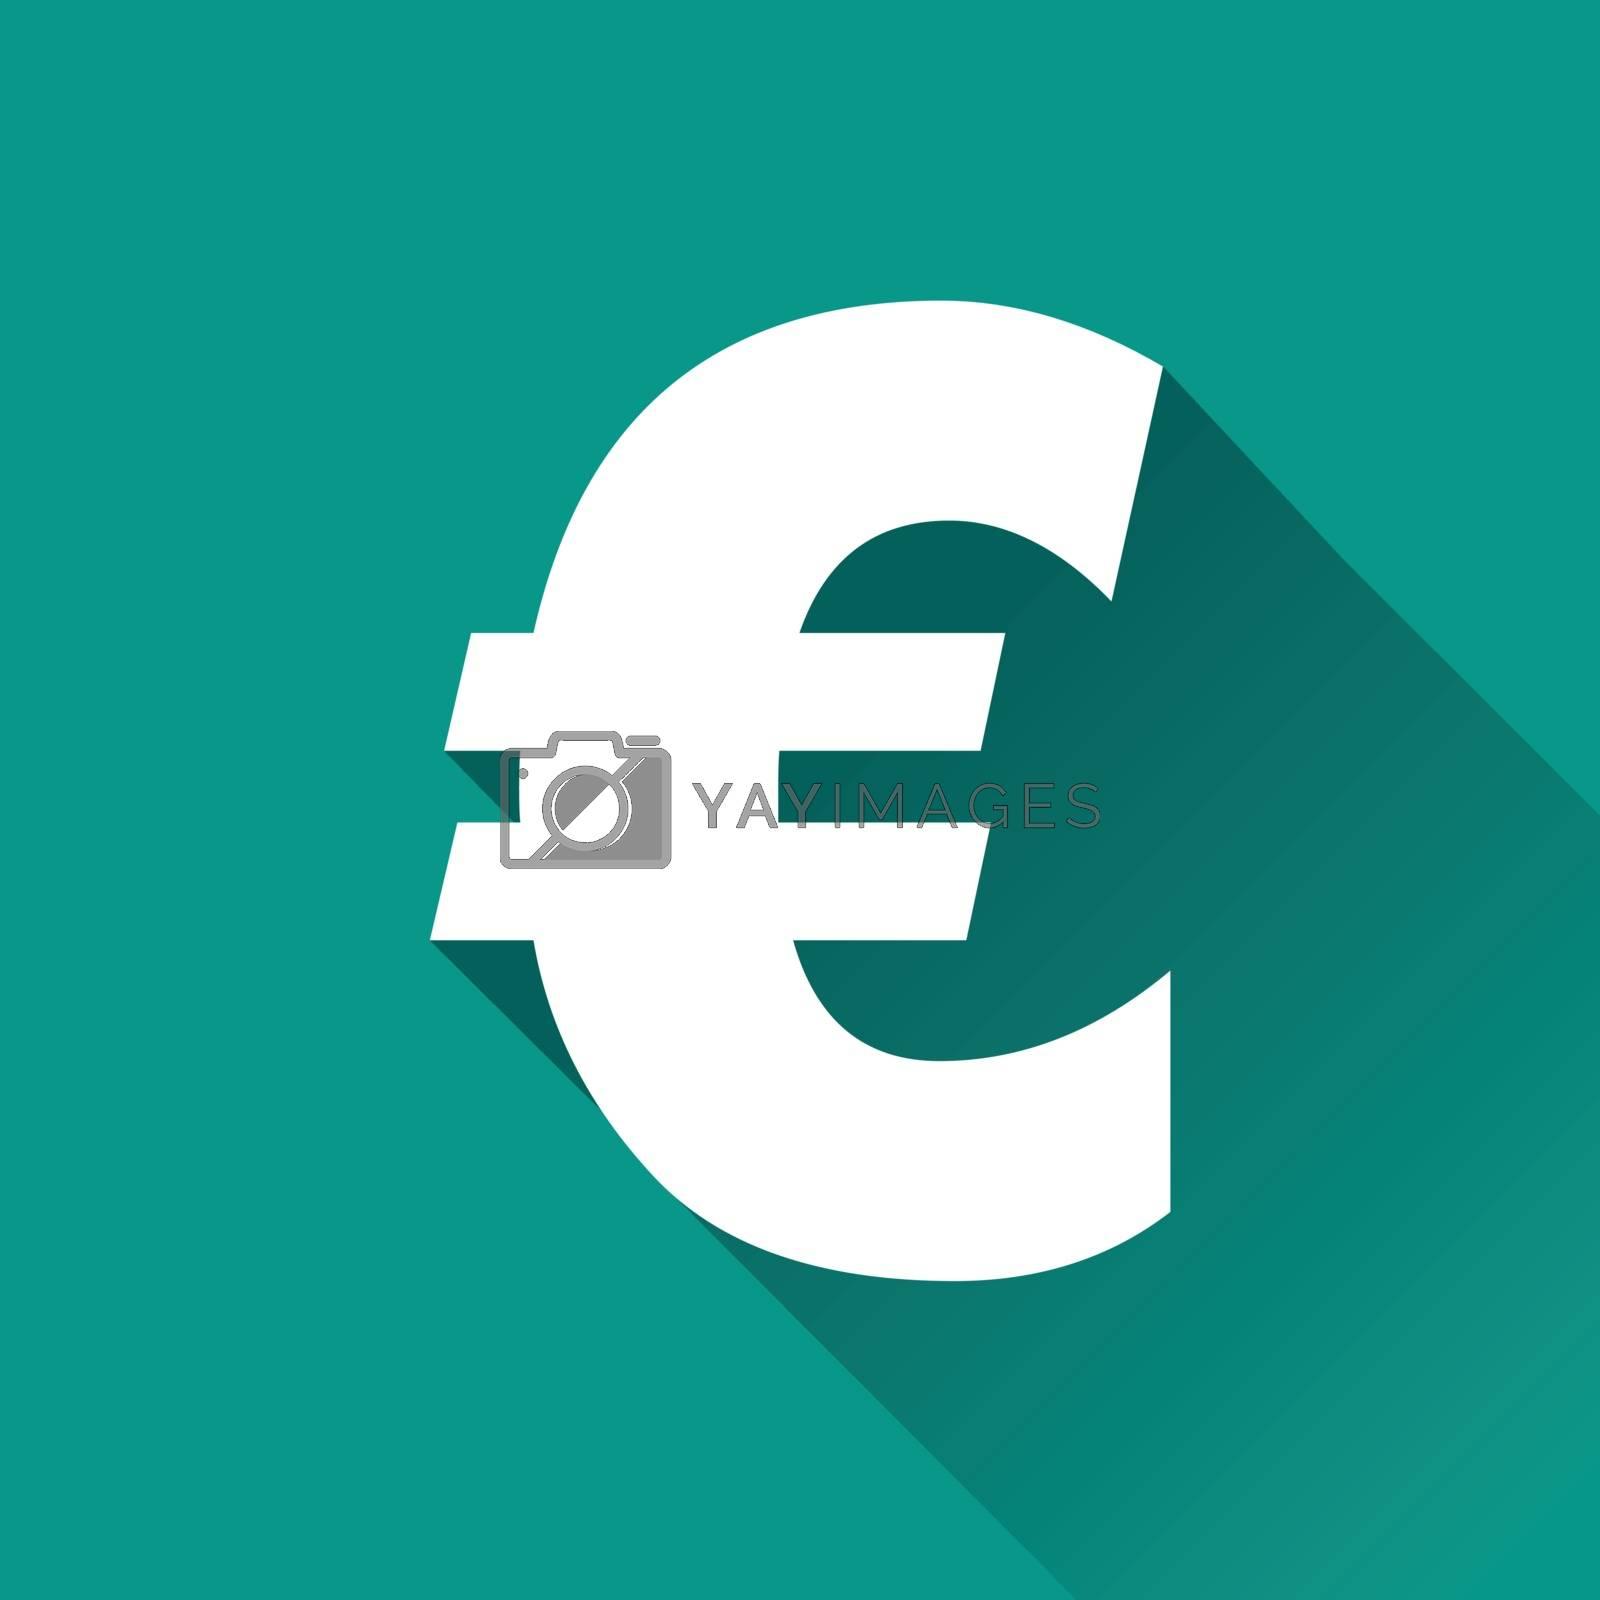 Royalty free image of euro flat design icon by nickylarson974